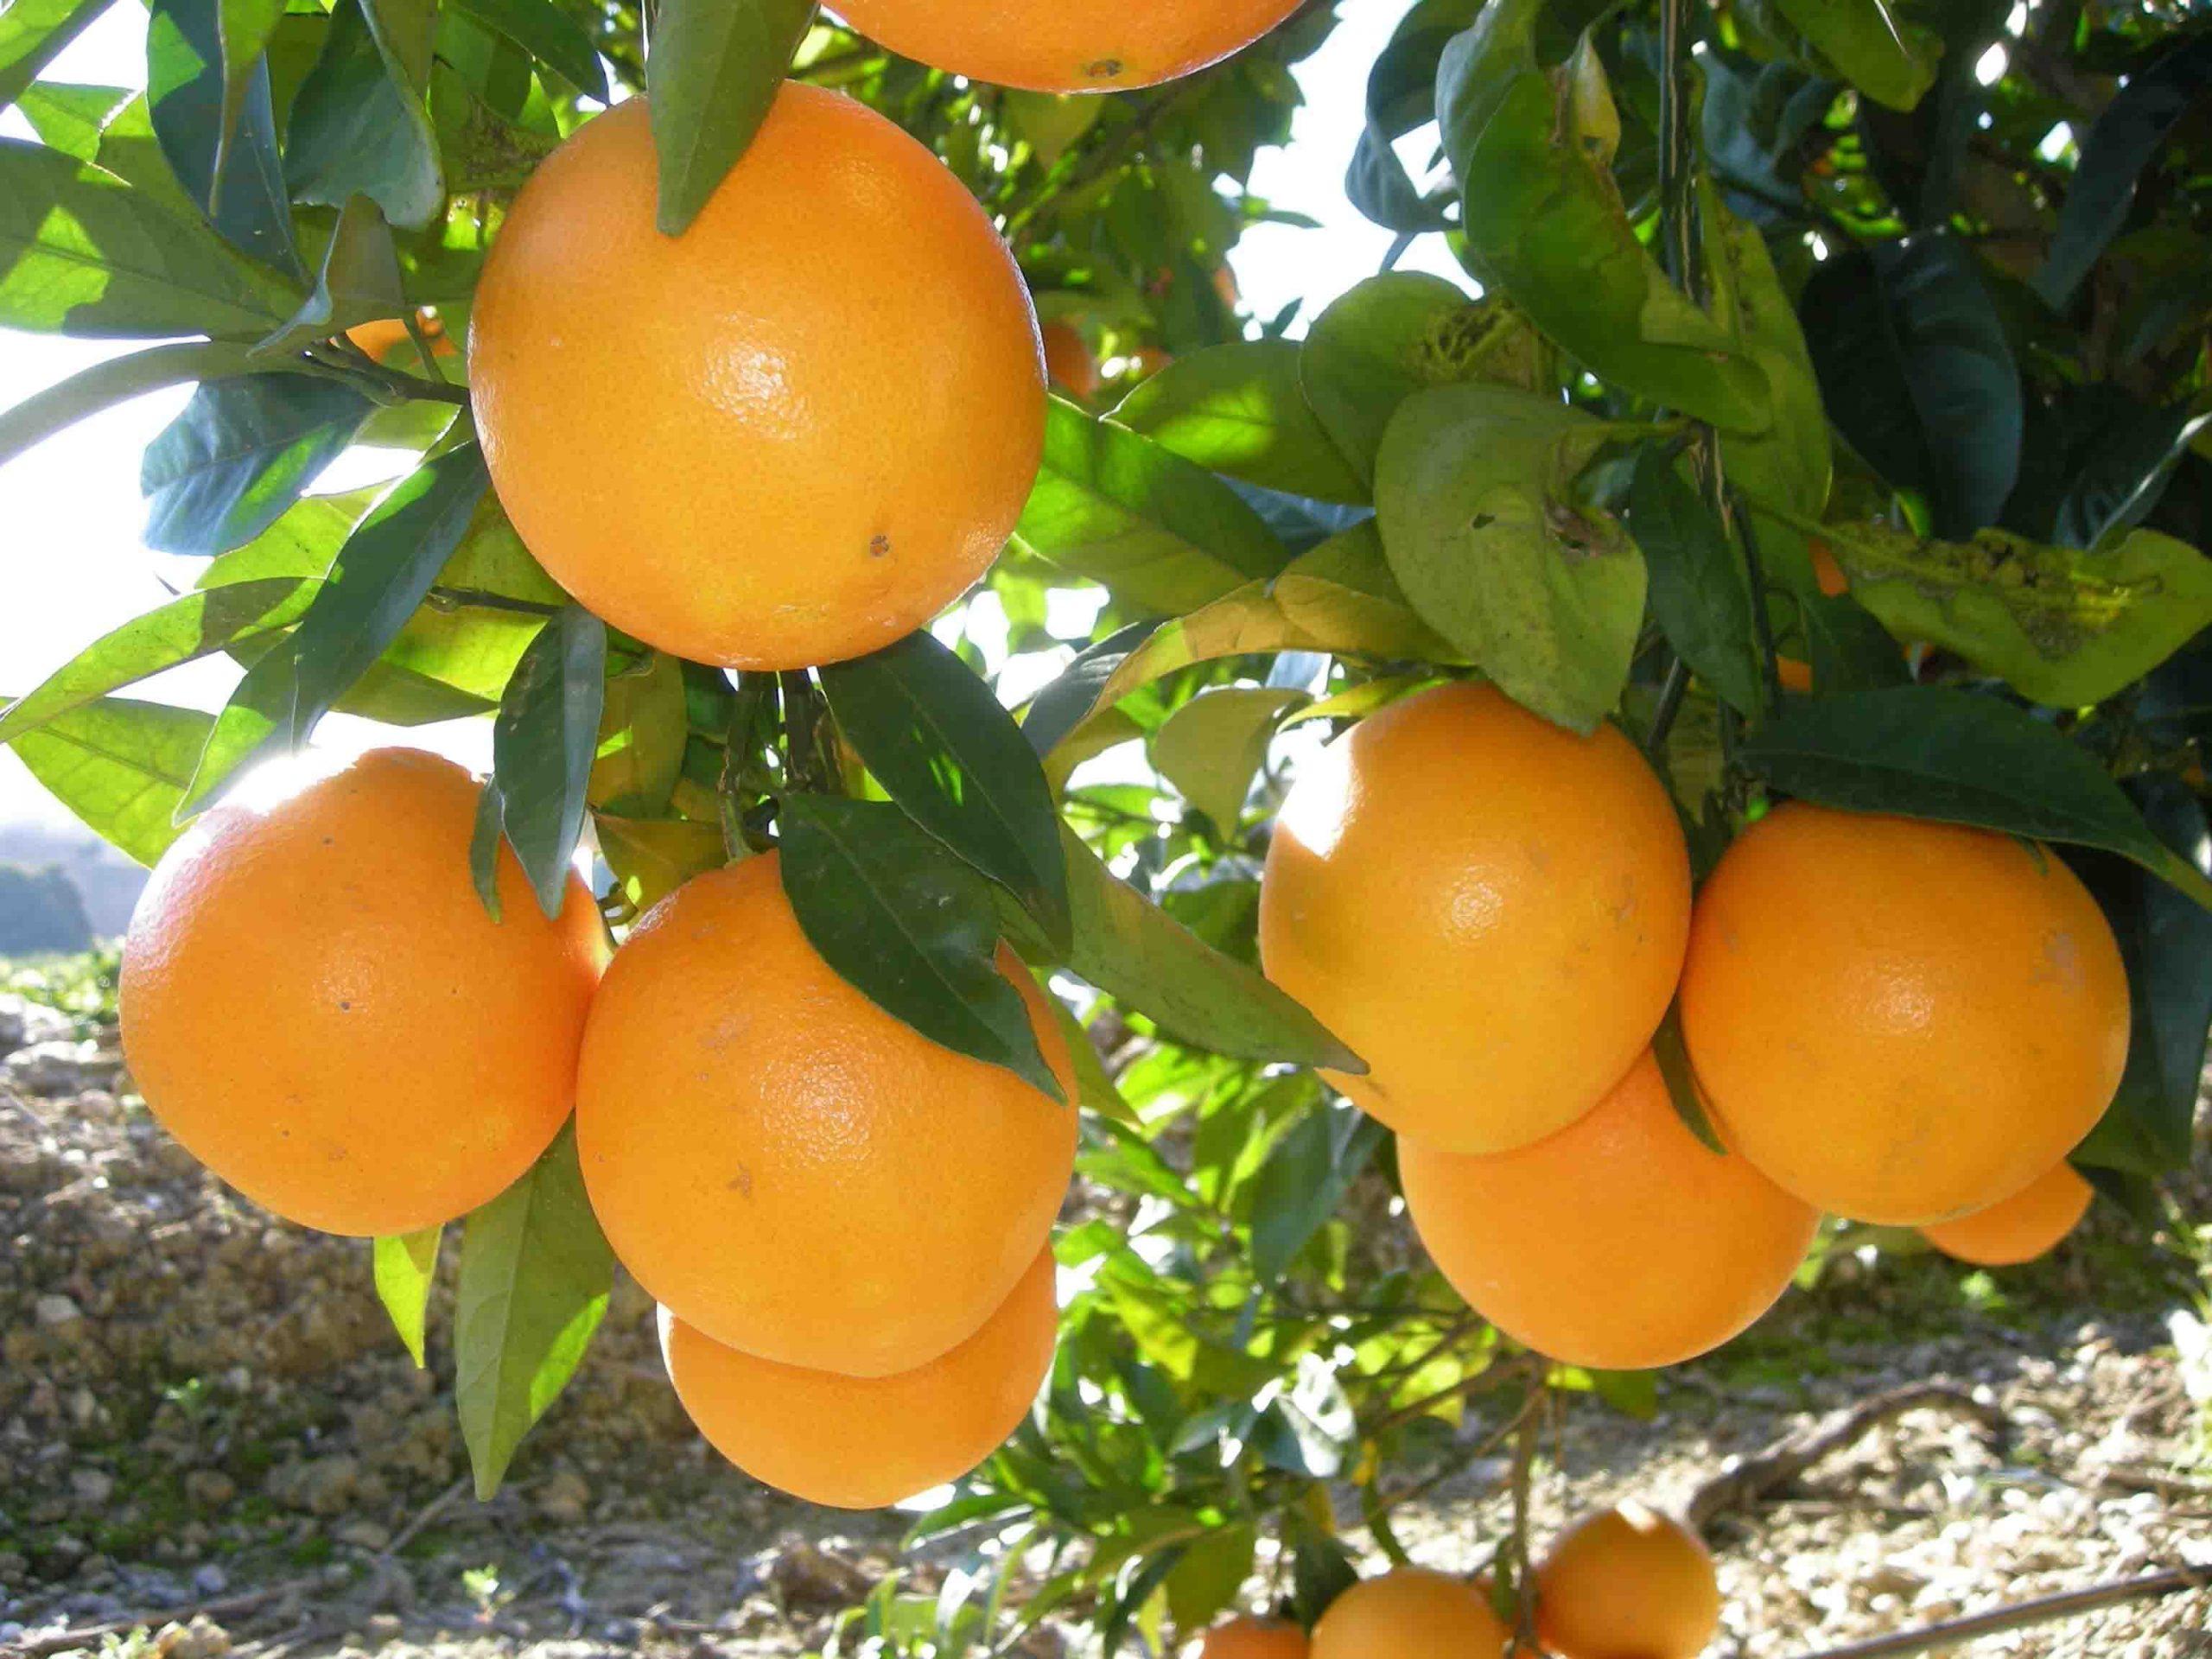 'Matafruit Naranjas' presenta la 'Ruta Turística y Gastronómica de la Naranja'